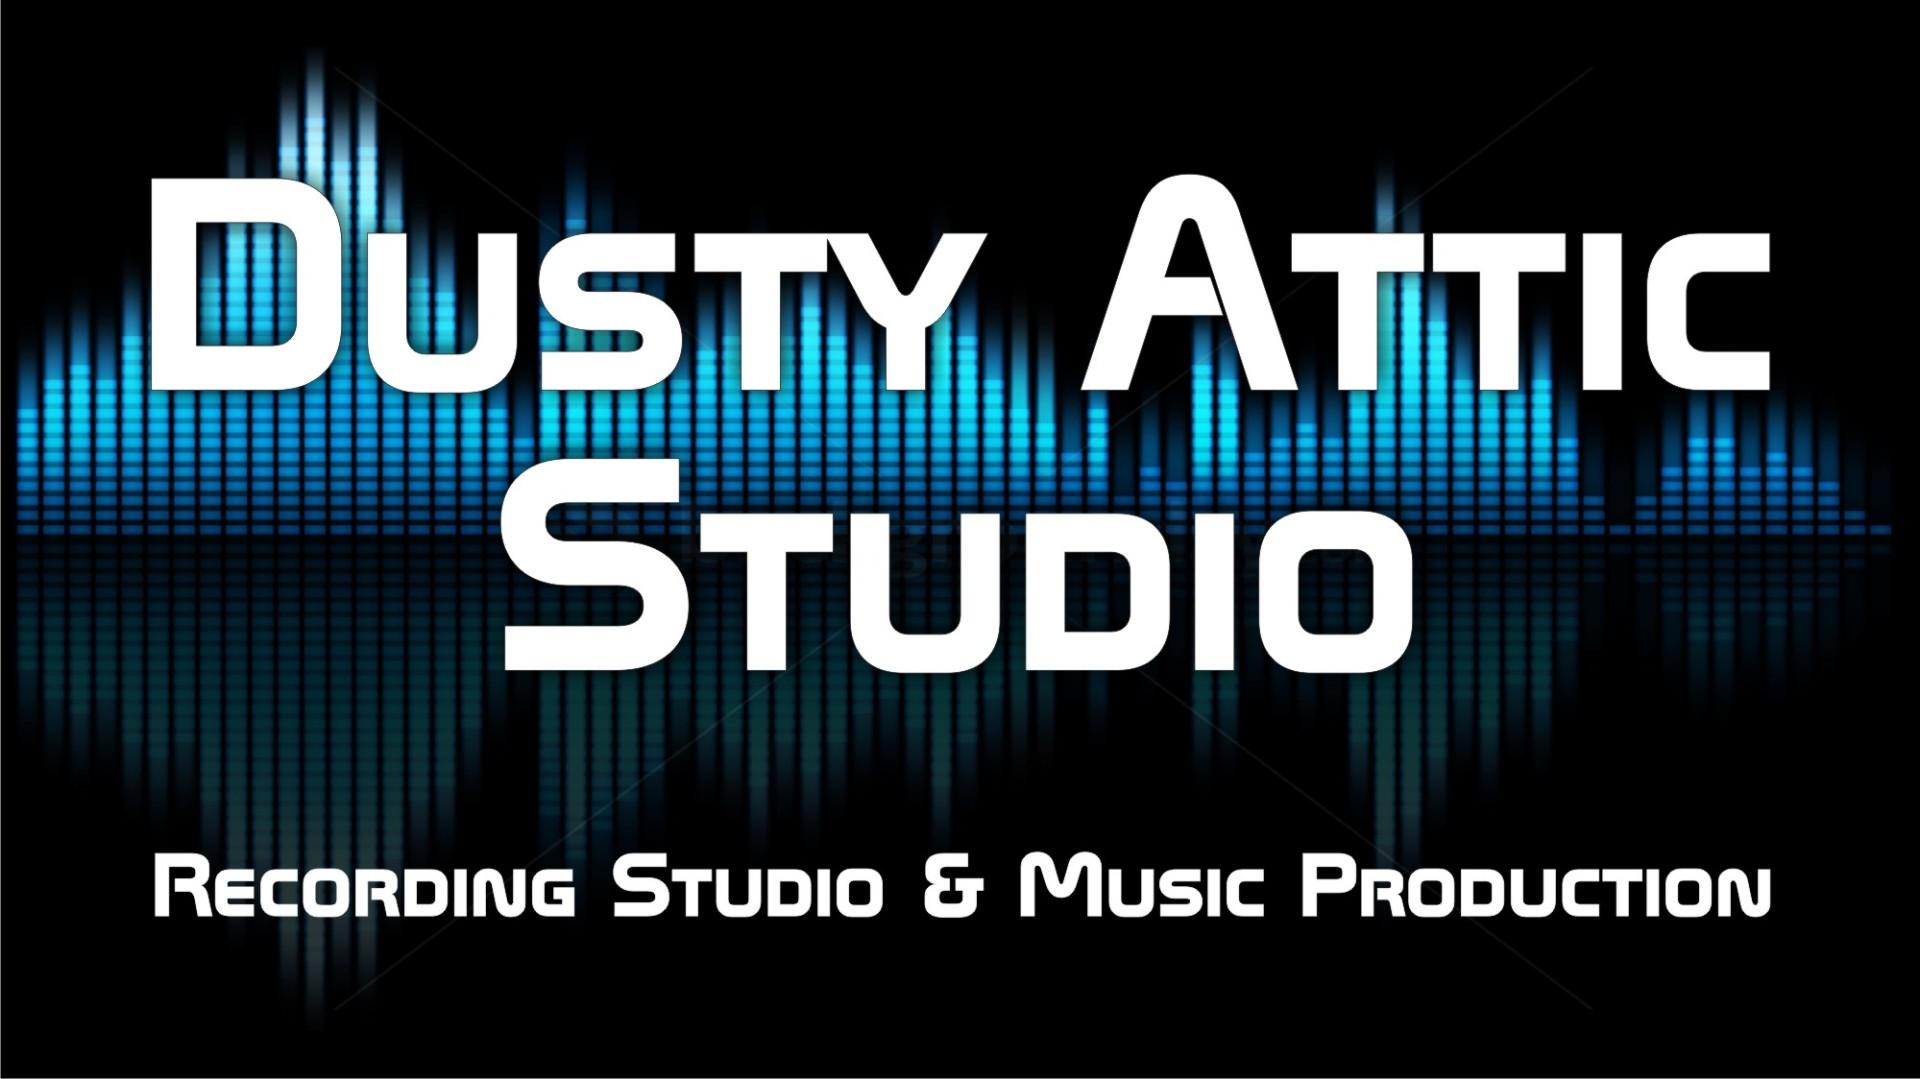 Dusty Attic Studio